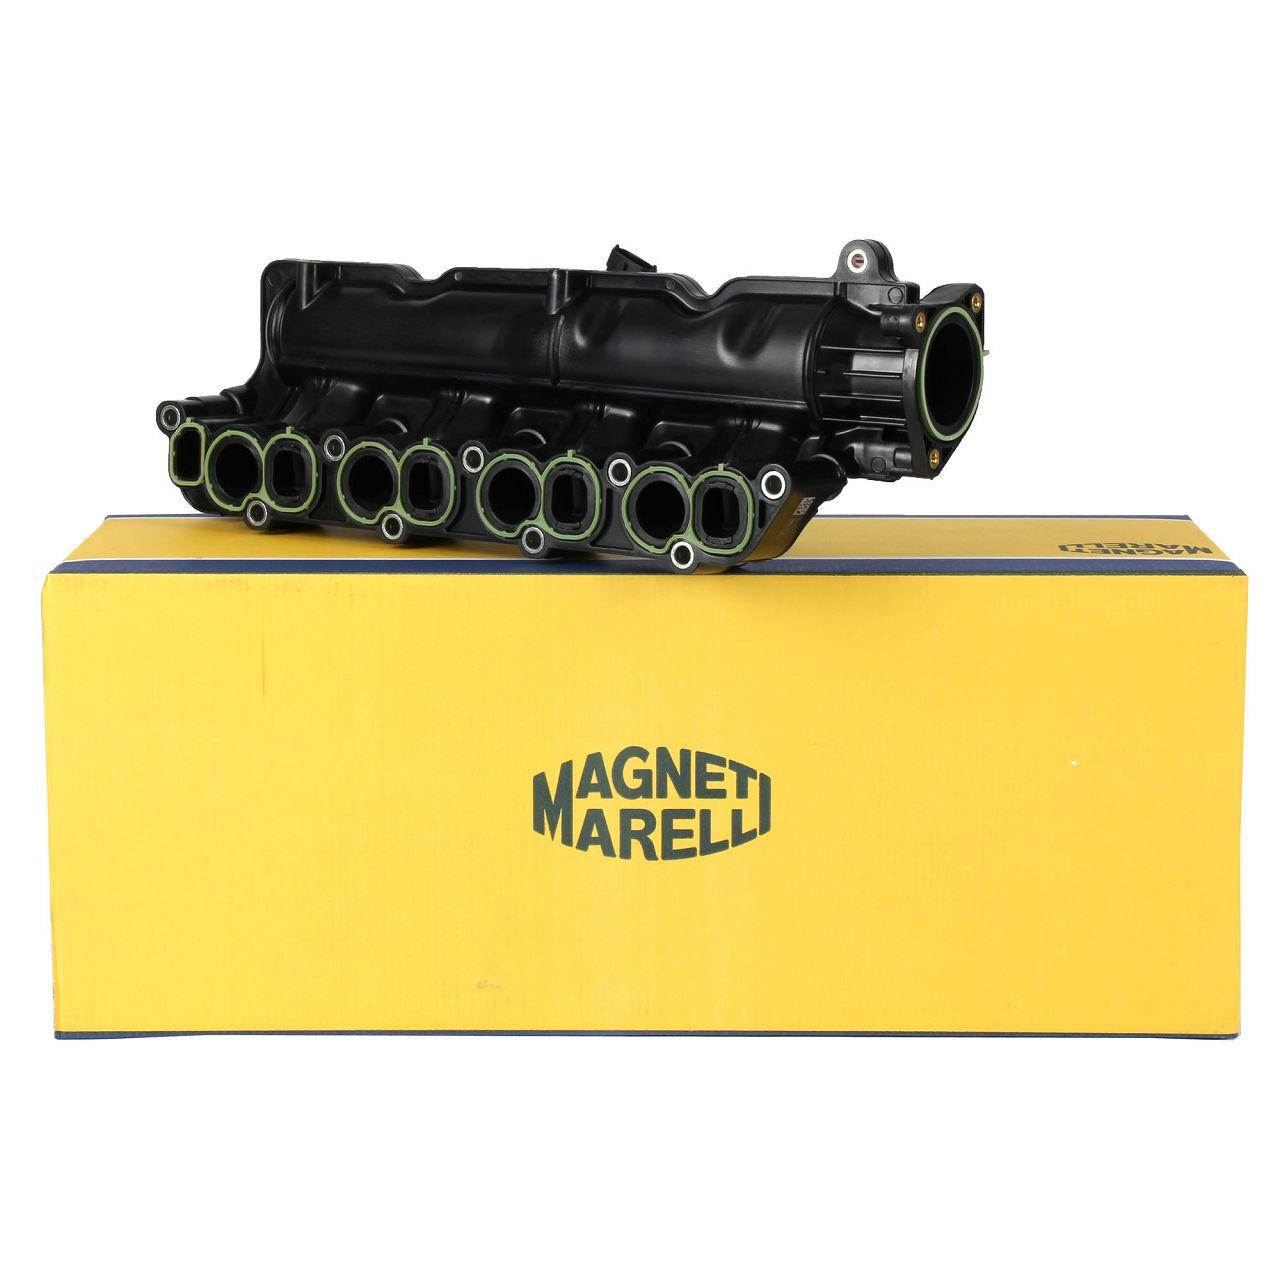 MAGNETI MARELLI Ansaugstutzen für ALFA ROMEO GIULIETTA FIAT 500L 1.6 DIESEL